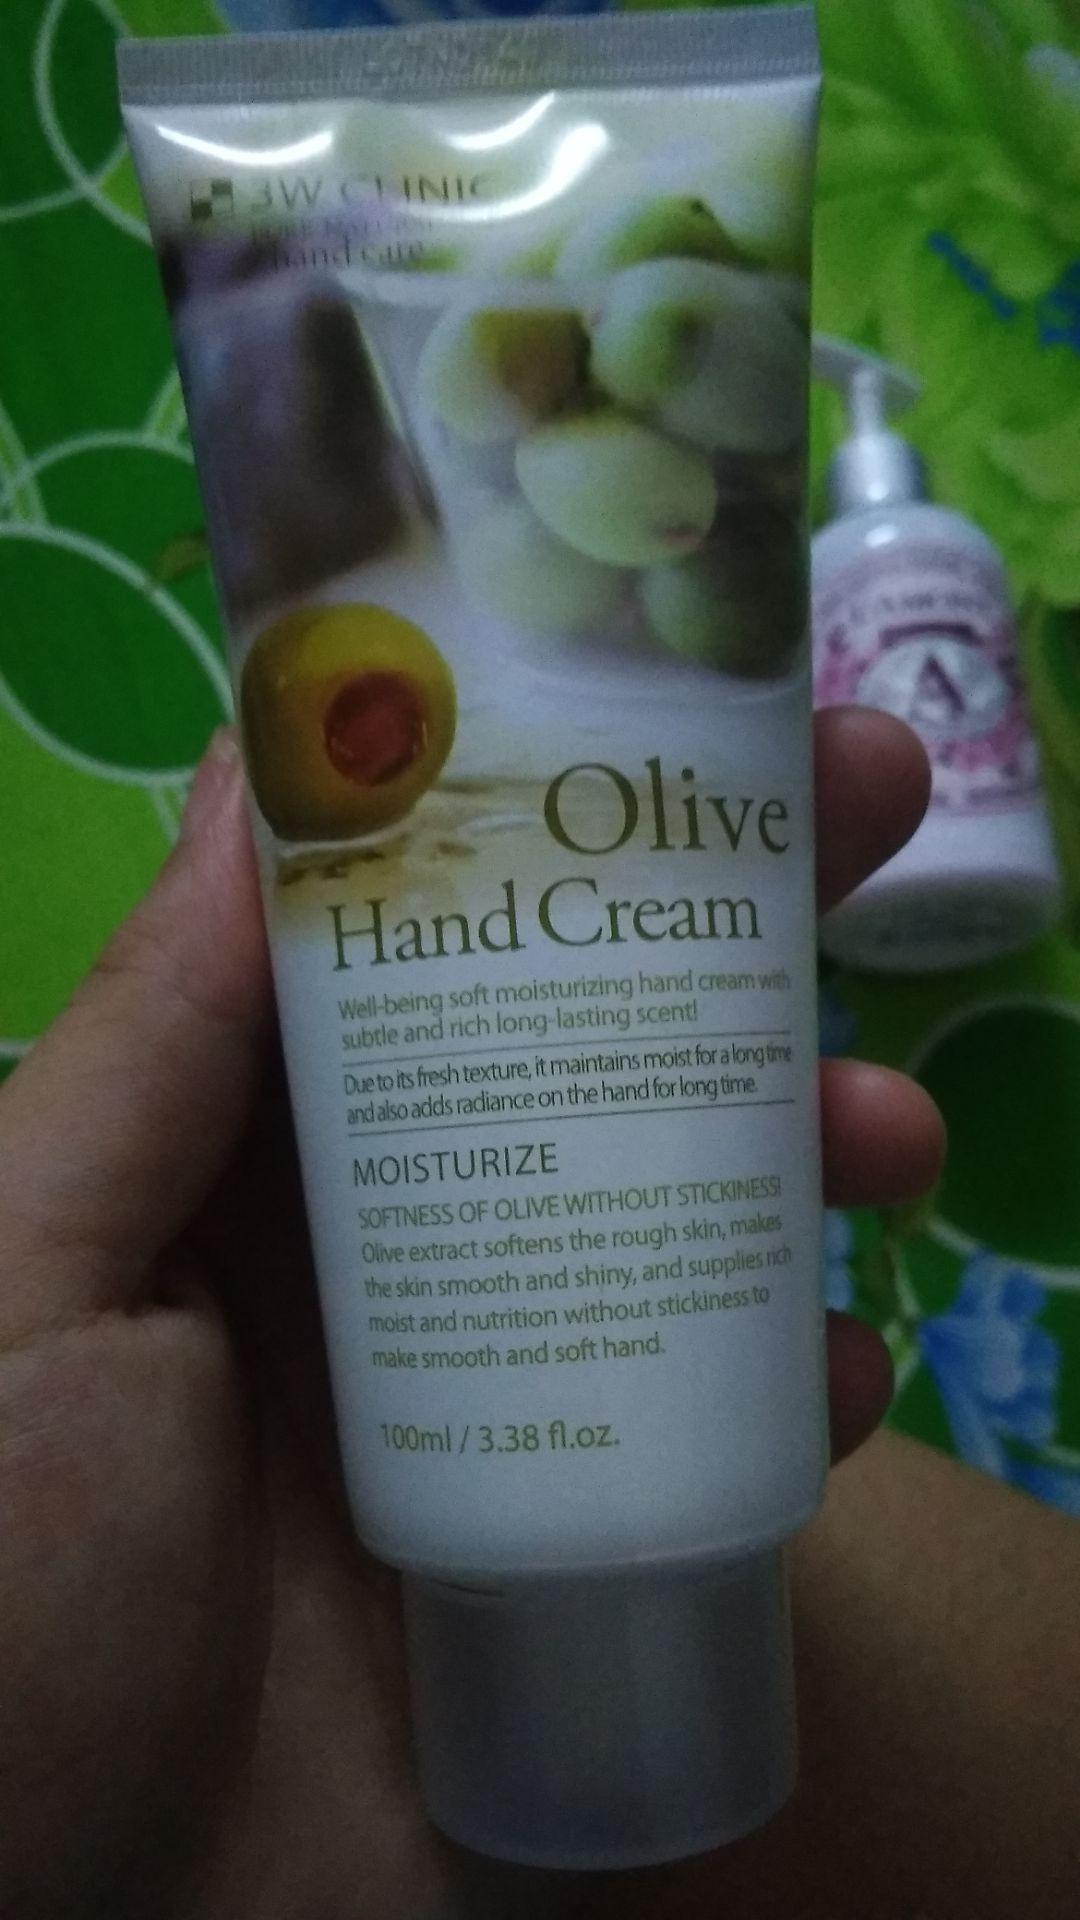 kem-duong-da-tay-olive-3w-clinic-hand-cream-100ml-p486667-review-19